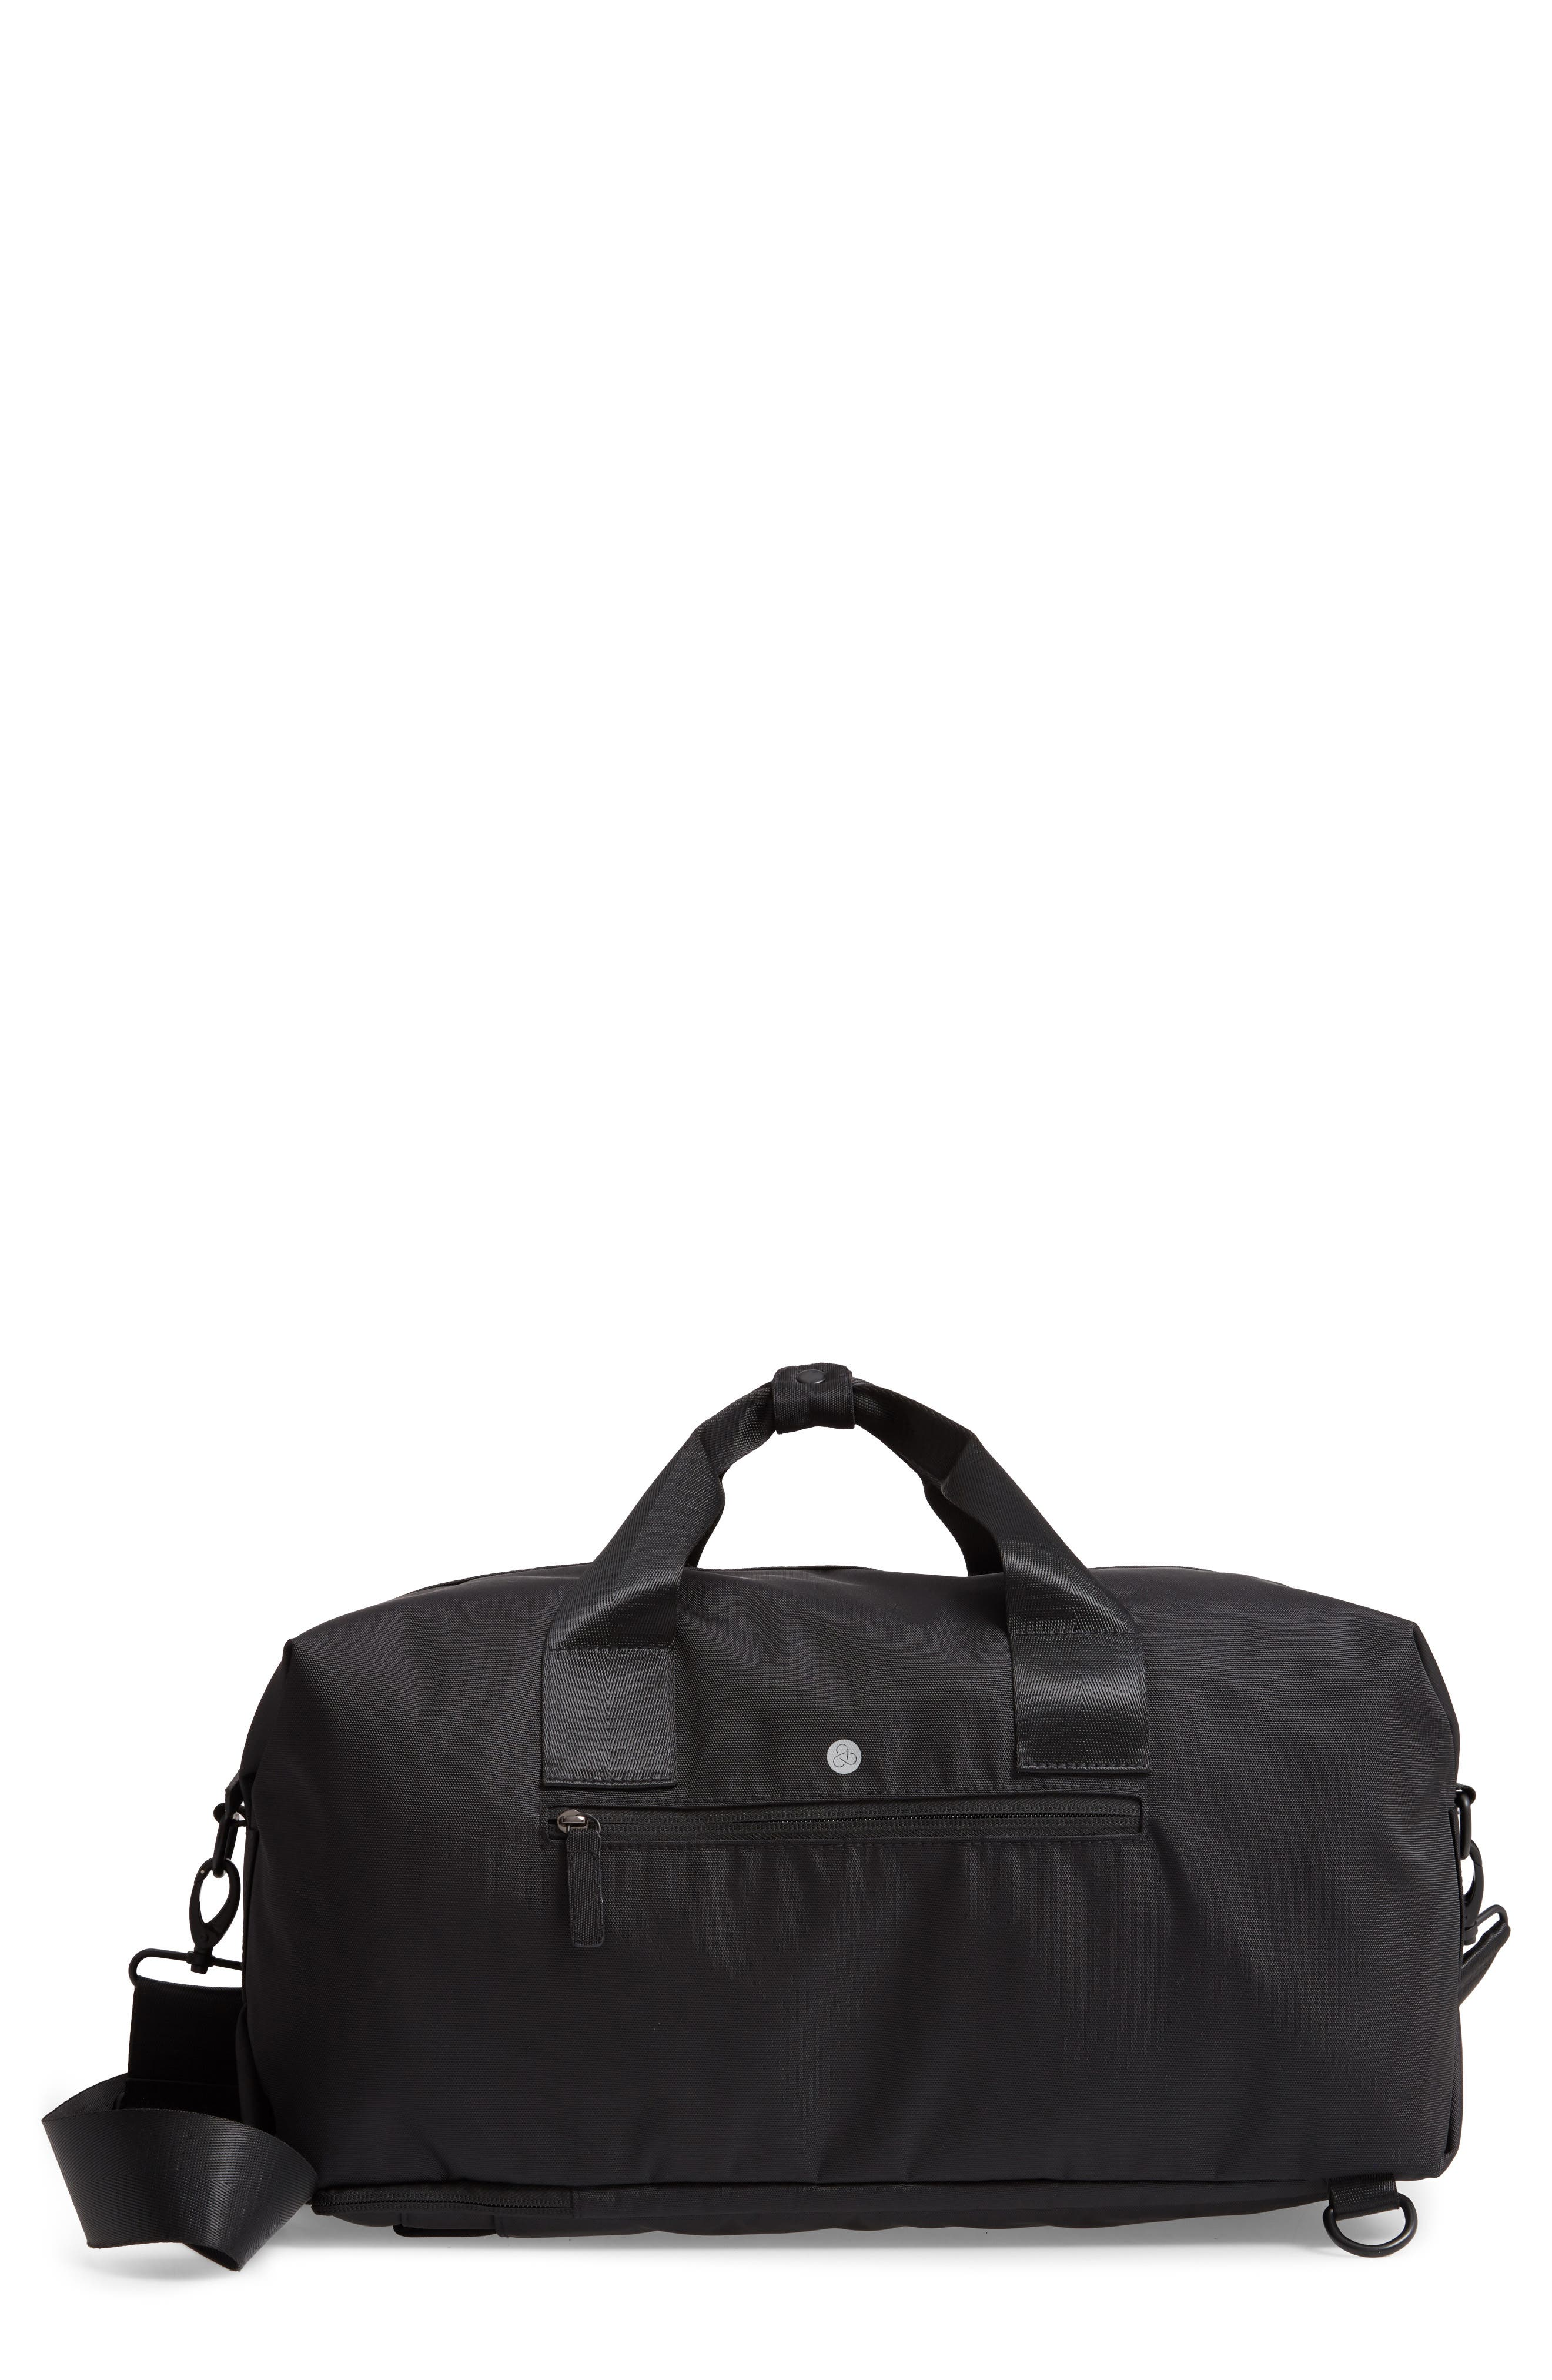 c44875c24313 Buy backpacks for women - Best women s backpacks shop - Cools.com